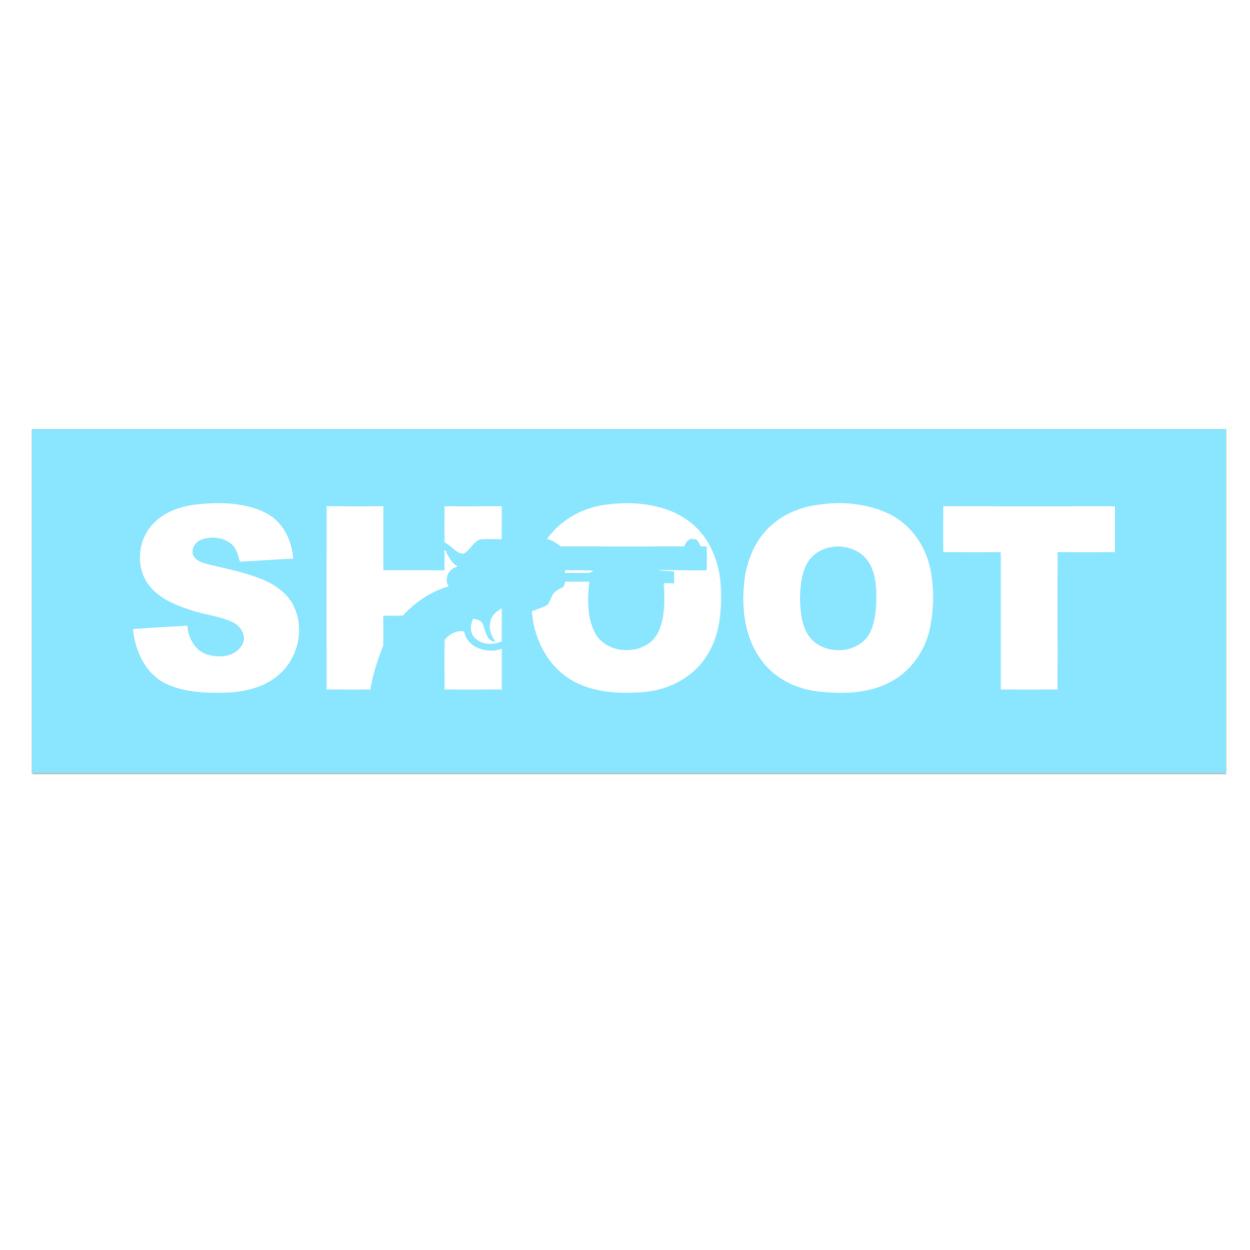 Shoot Gun Logo Classic Decal (White Logo)